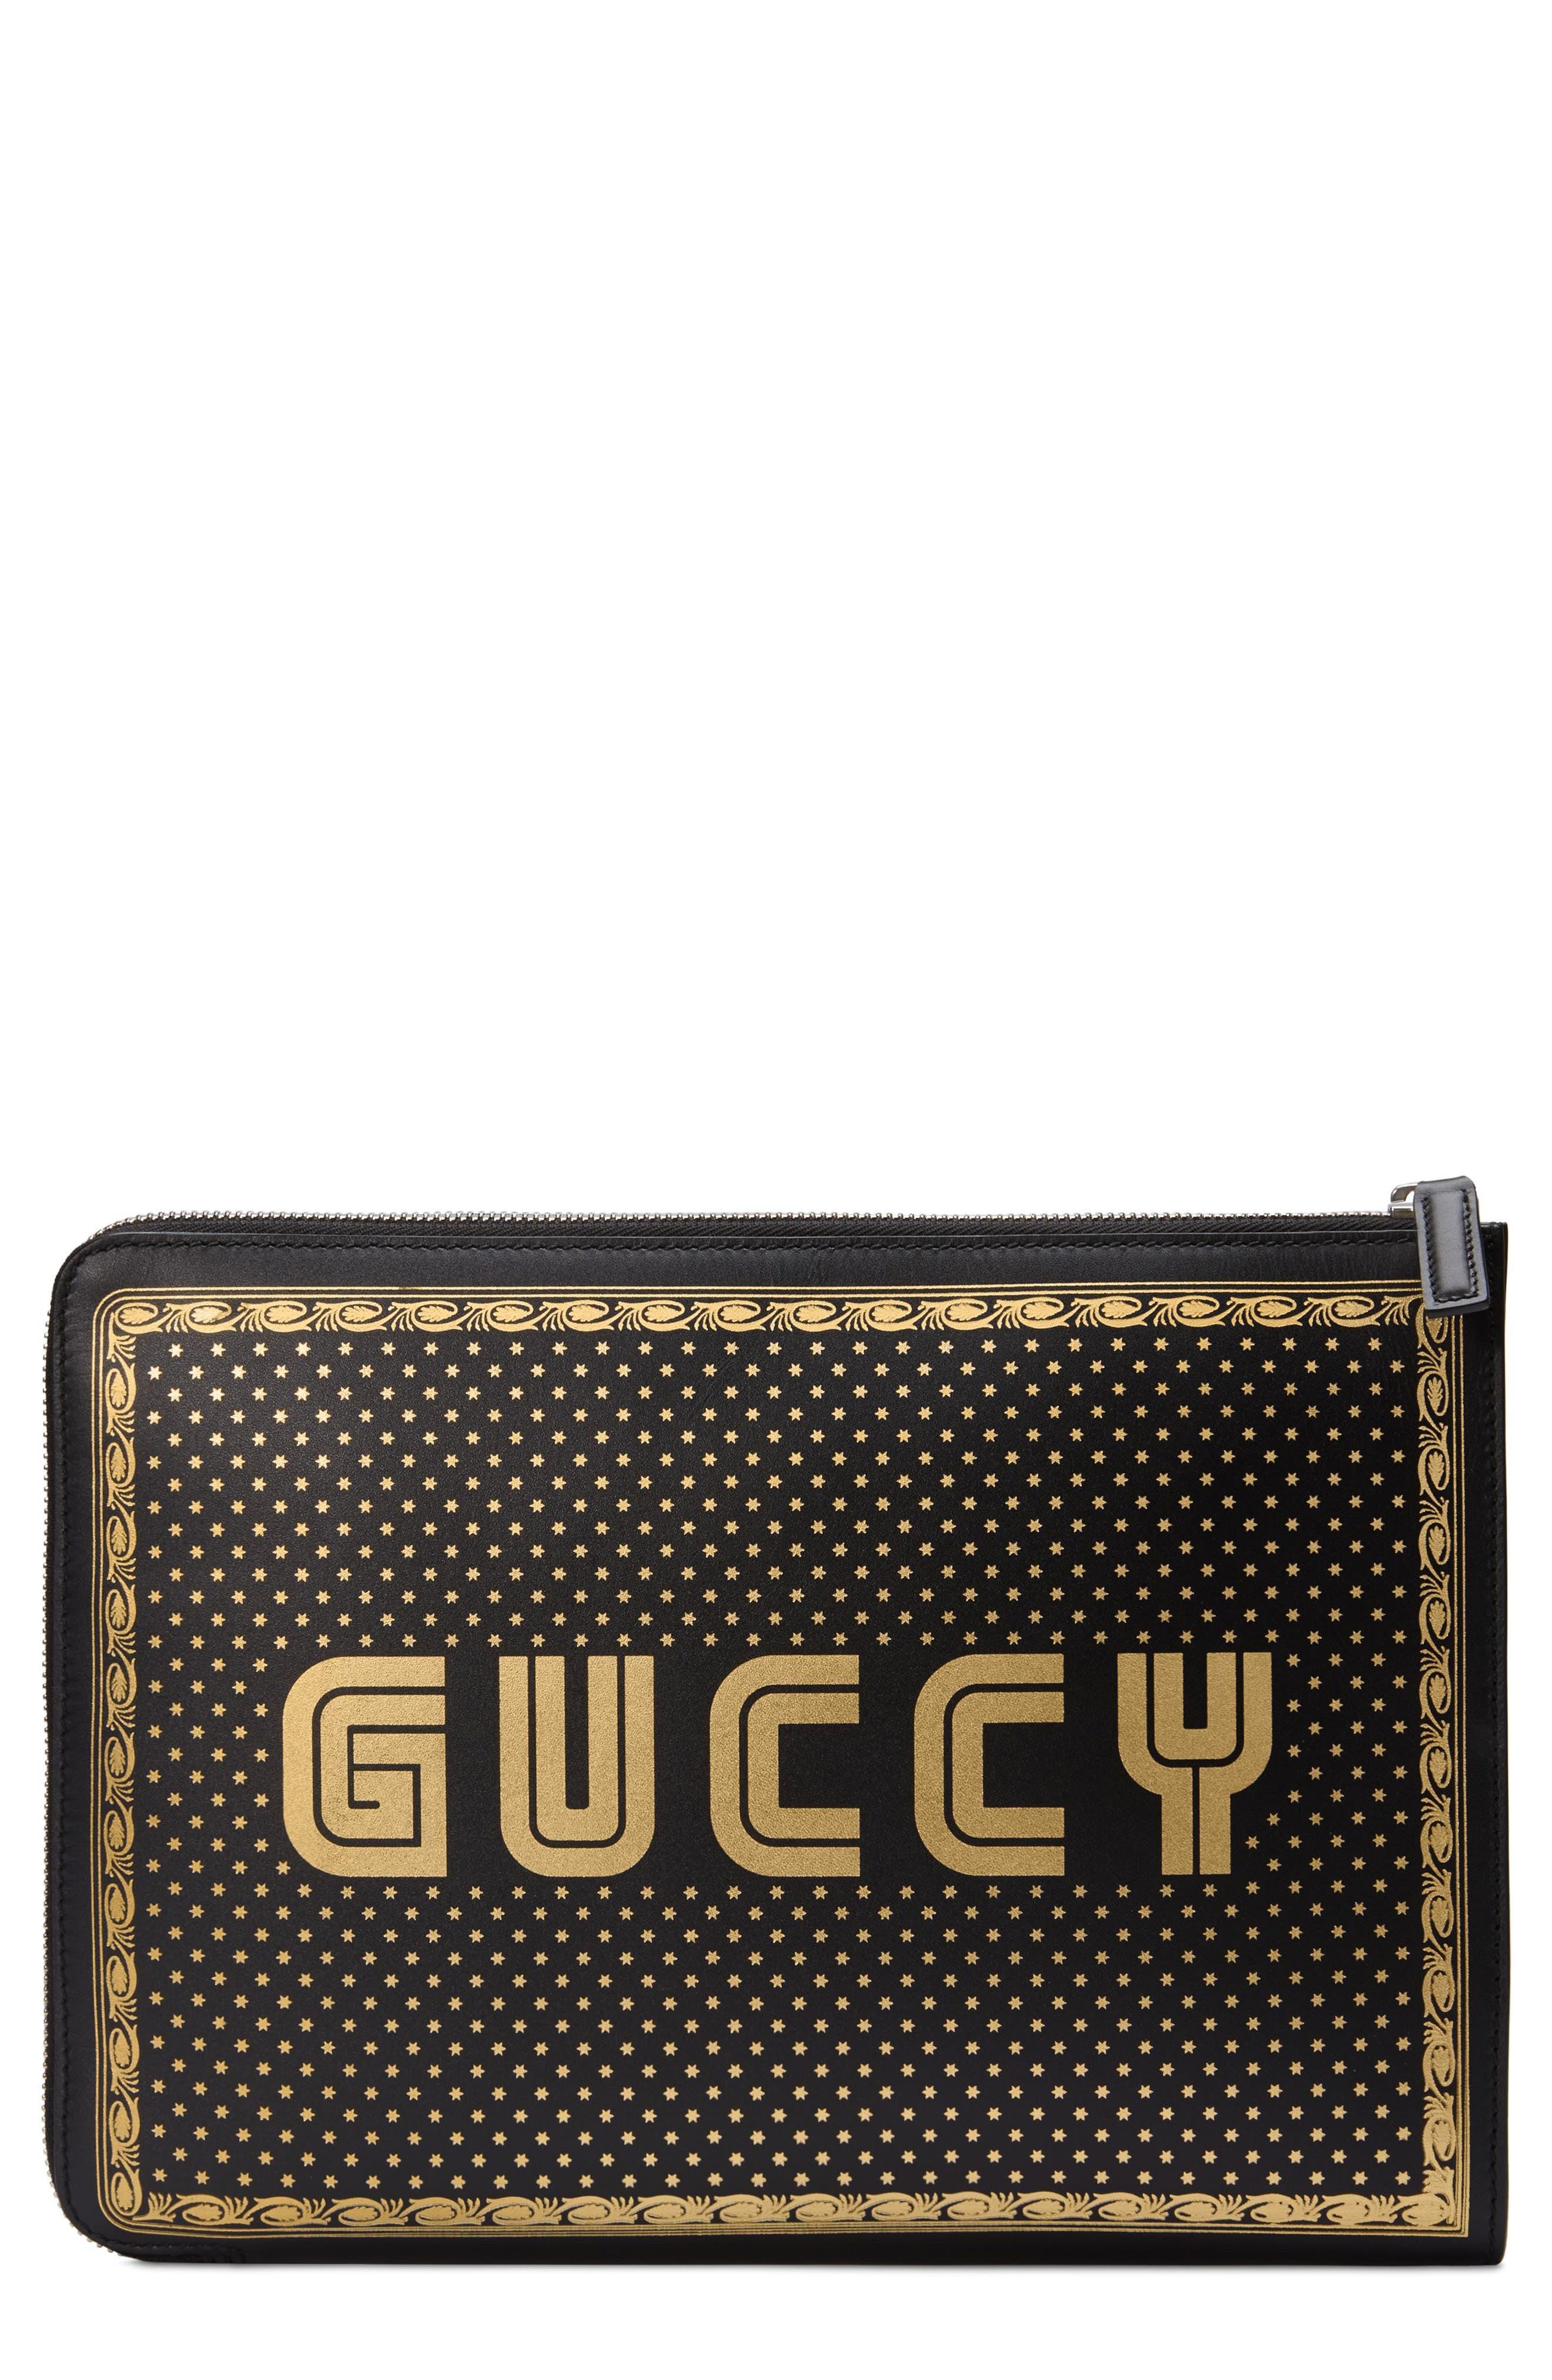 Guccy Logo Moon & Stars Leather Clutch,                             Main thumbnail 1, color,                             Nero Oro/ Nero